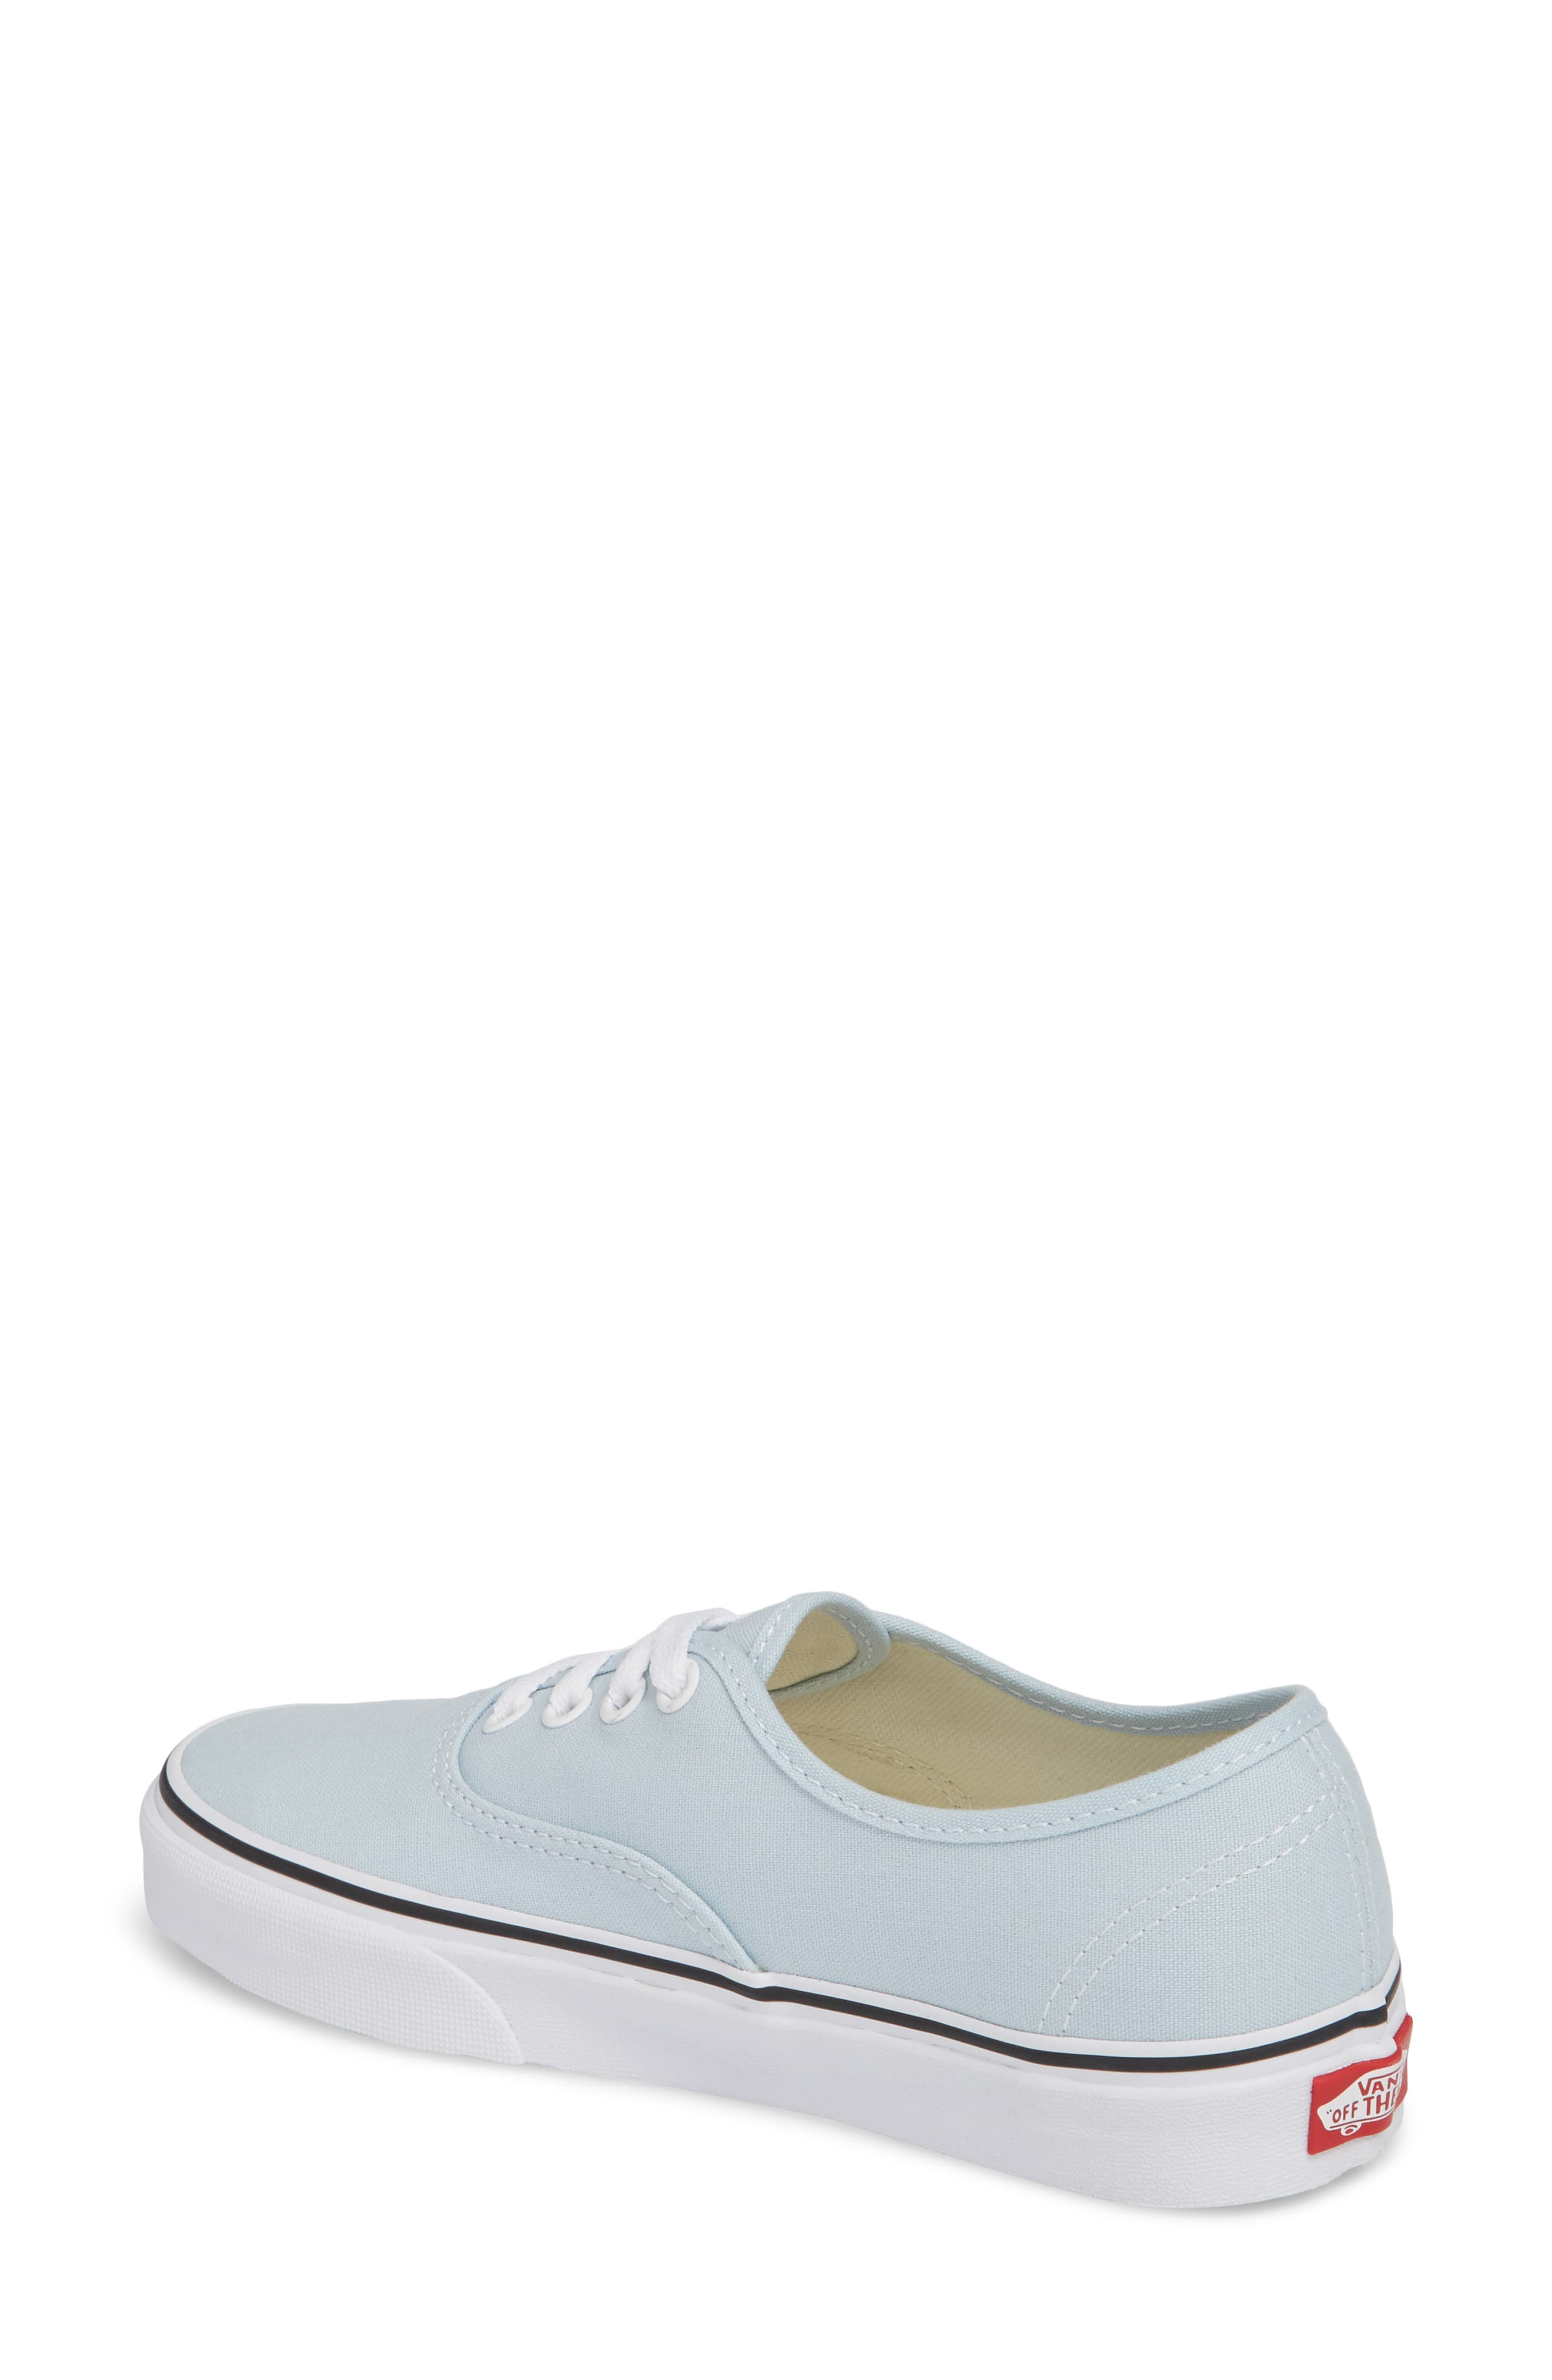 ,                             'Authentic' Sneaker,                             Alternate thumbnail 329, color,                             450